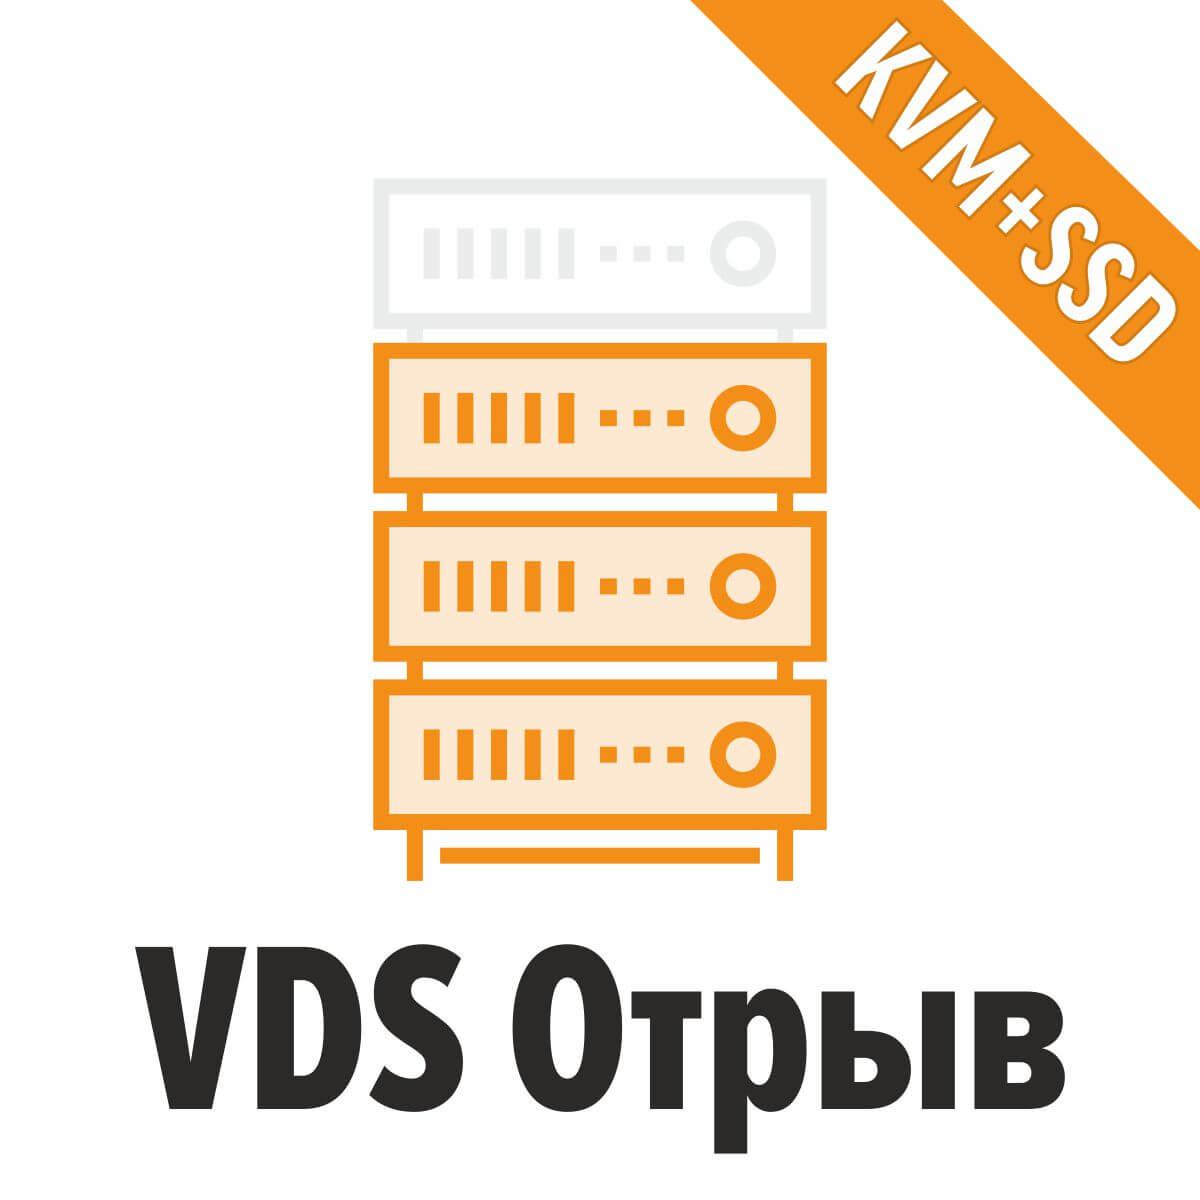 VDS Отрыв (KVM, SSD, 4 Core, 4Gb RAM, 60Gb SSD)